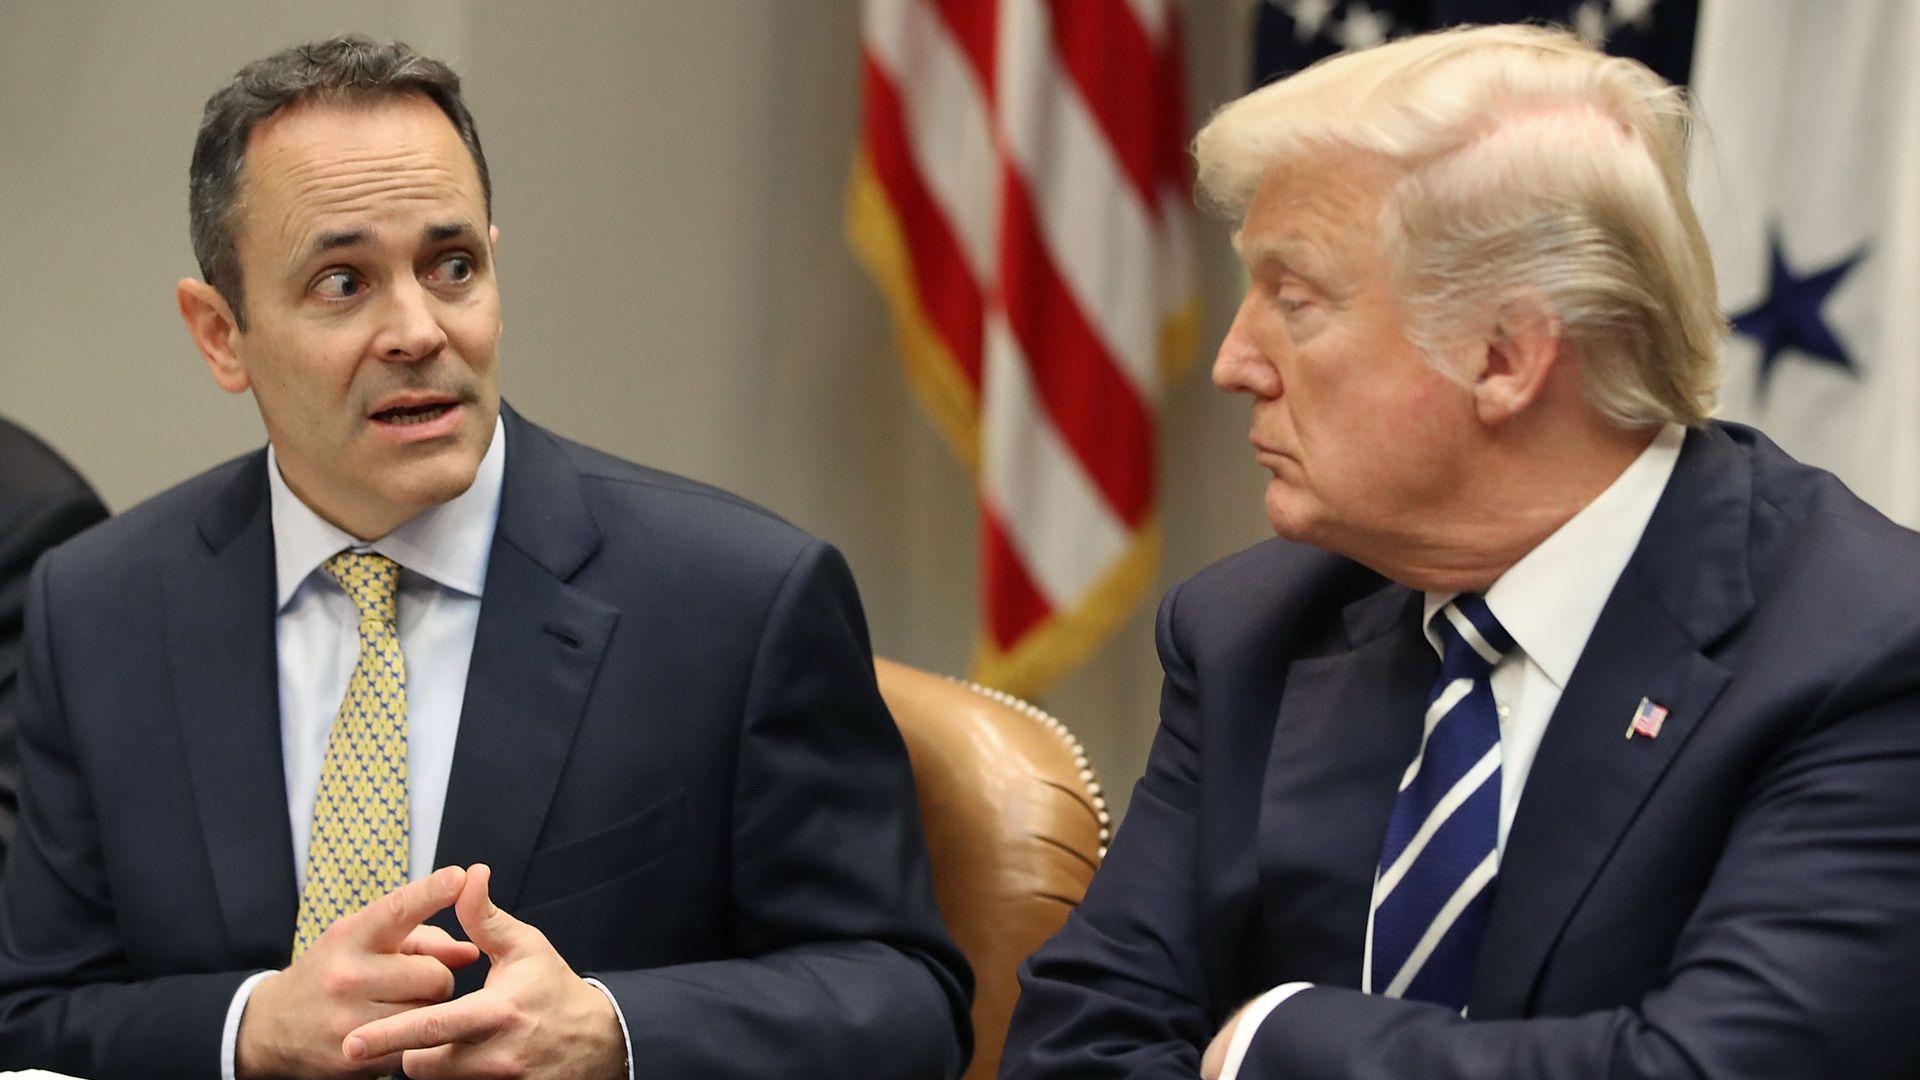 Kentucky Gov. Matt Bevin with President Trump